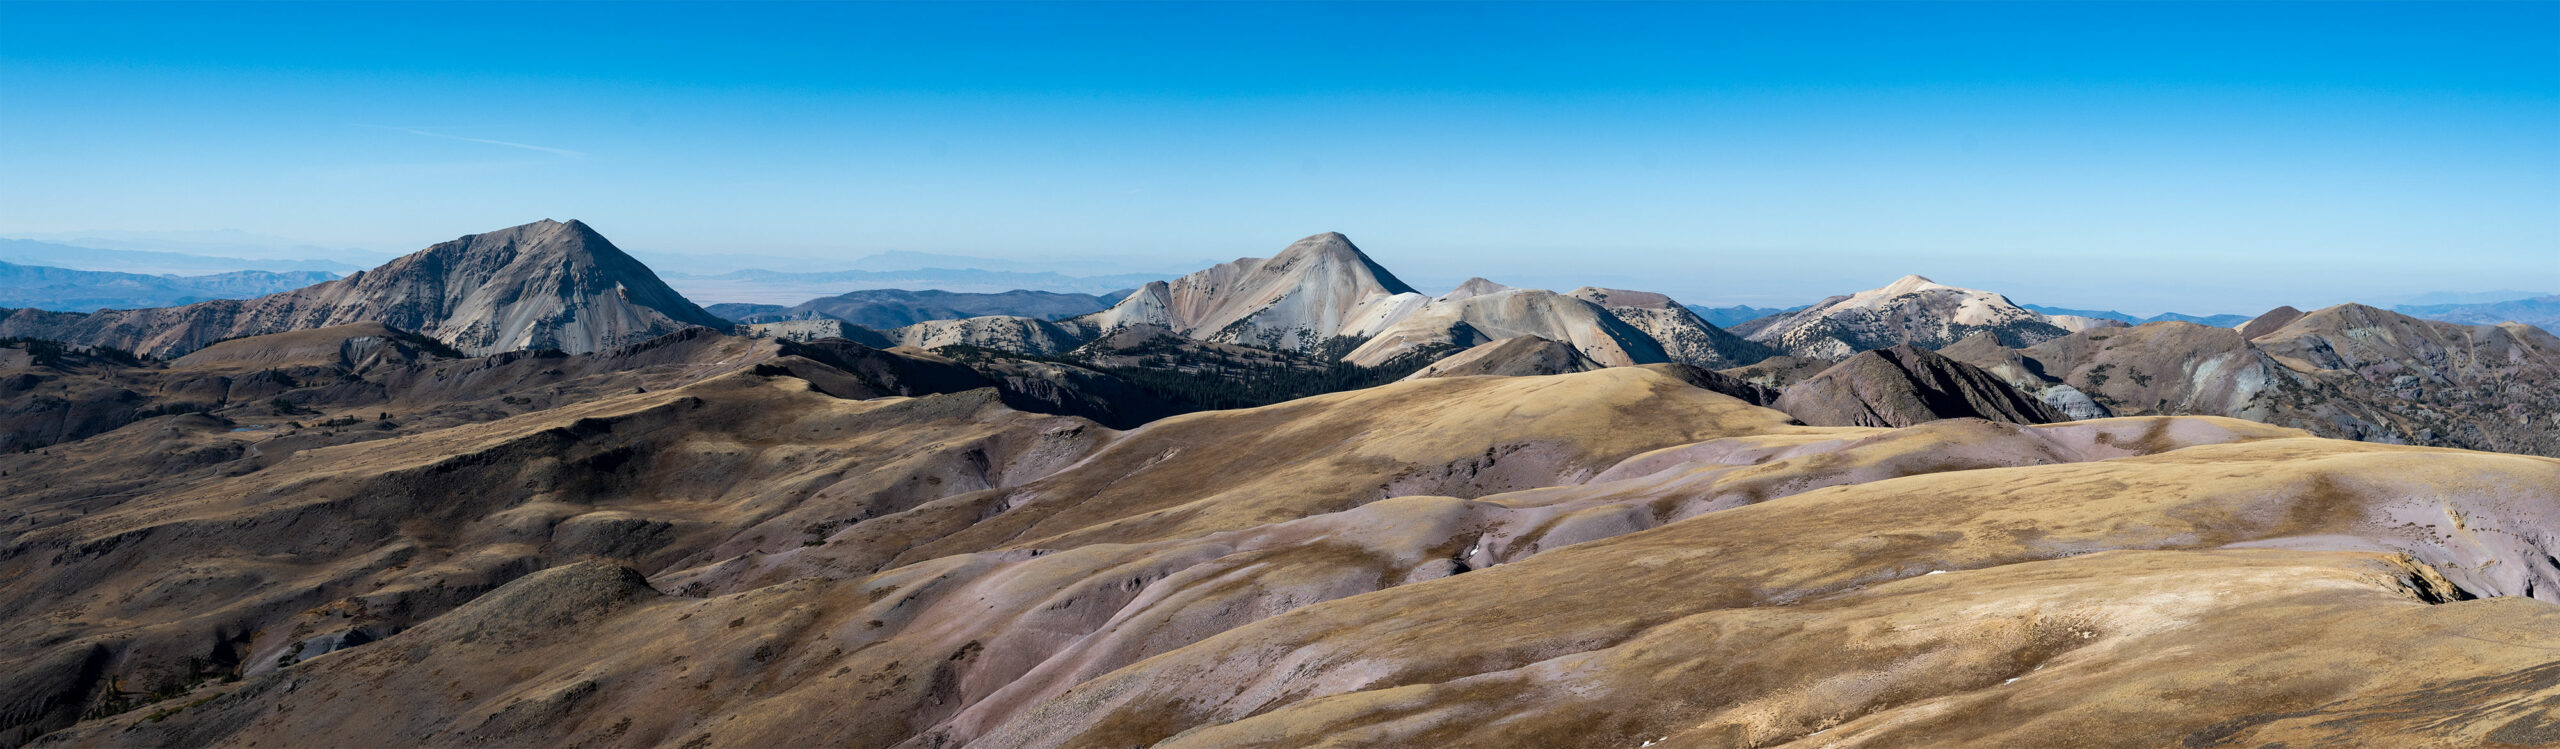 Mt. Baldy & Mt. Belknap from Delano's summit